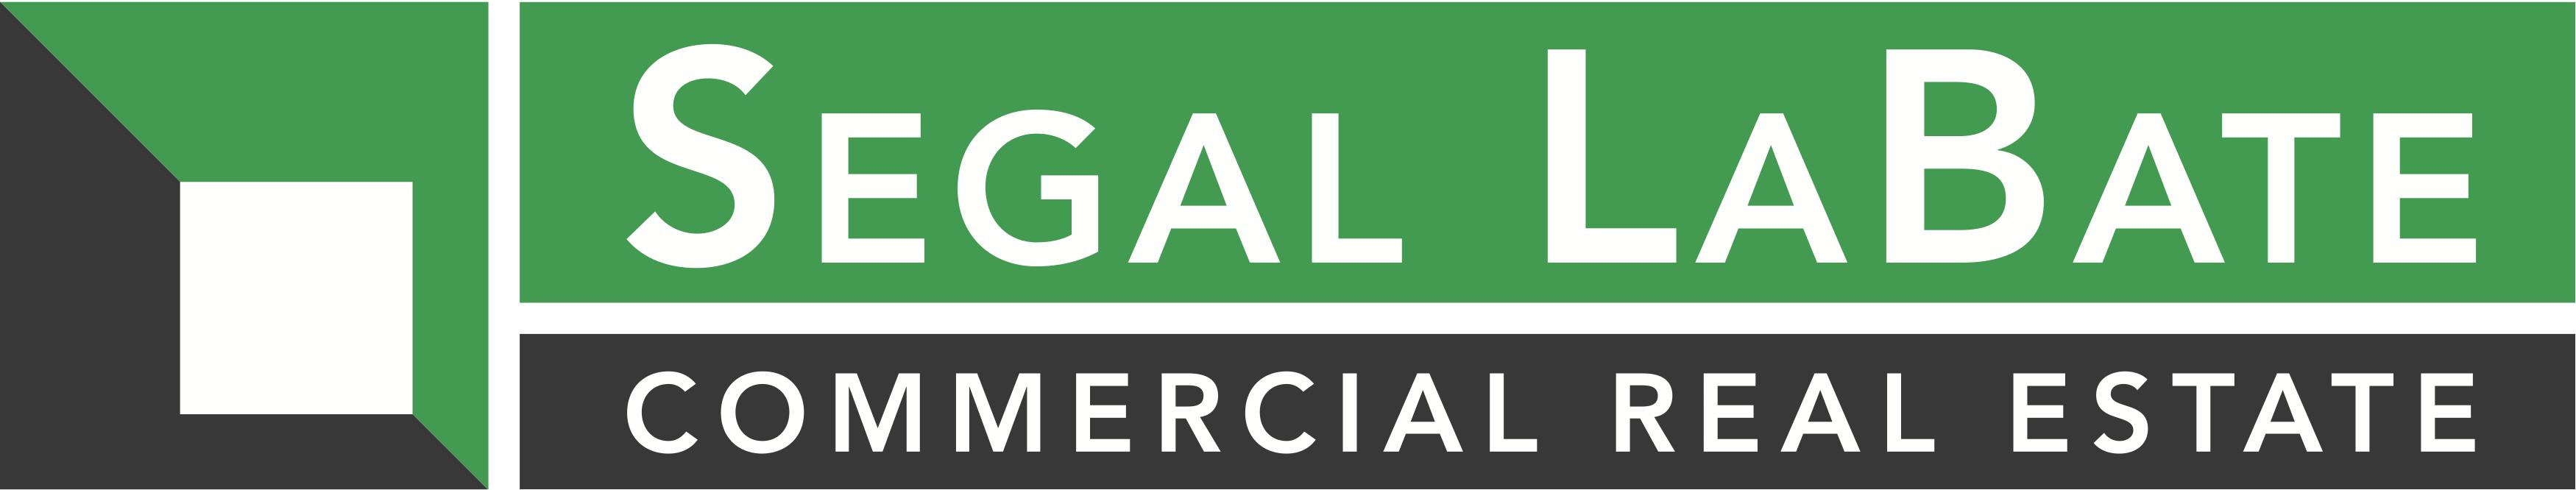 Segal LaBate Commercial Real Estate